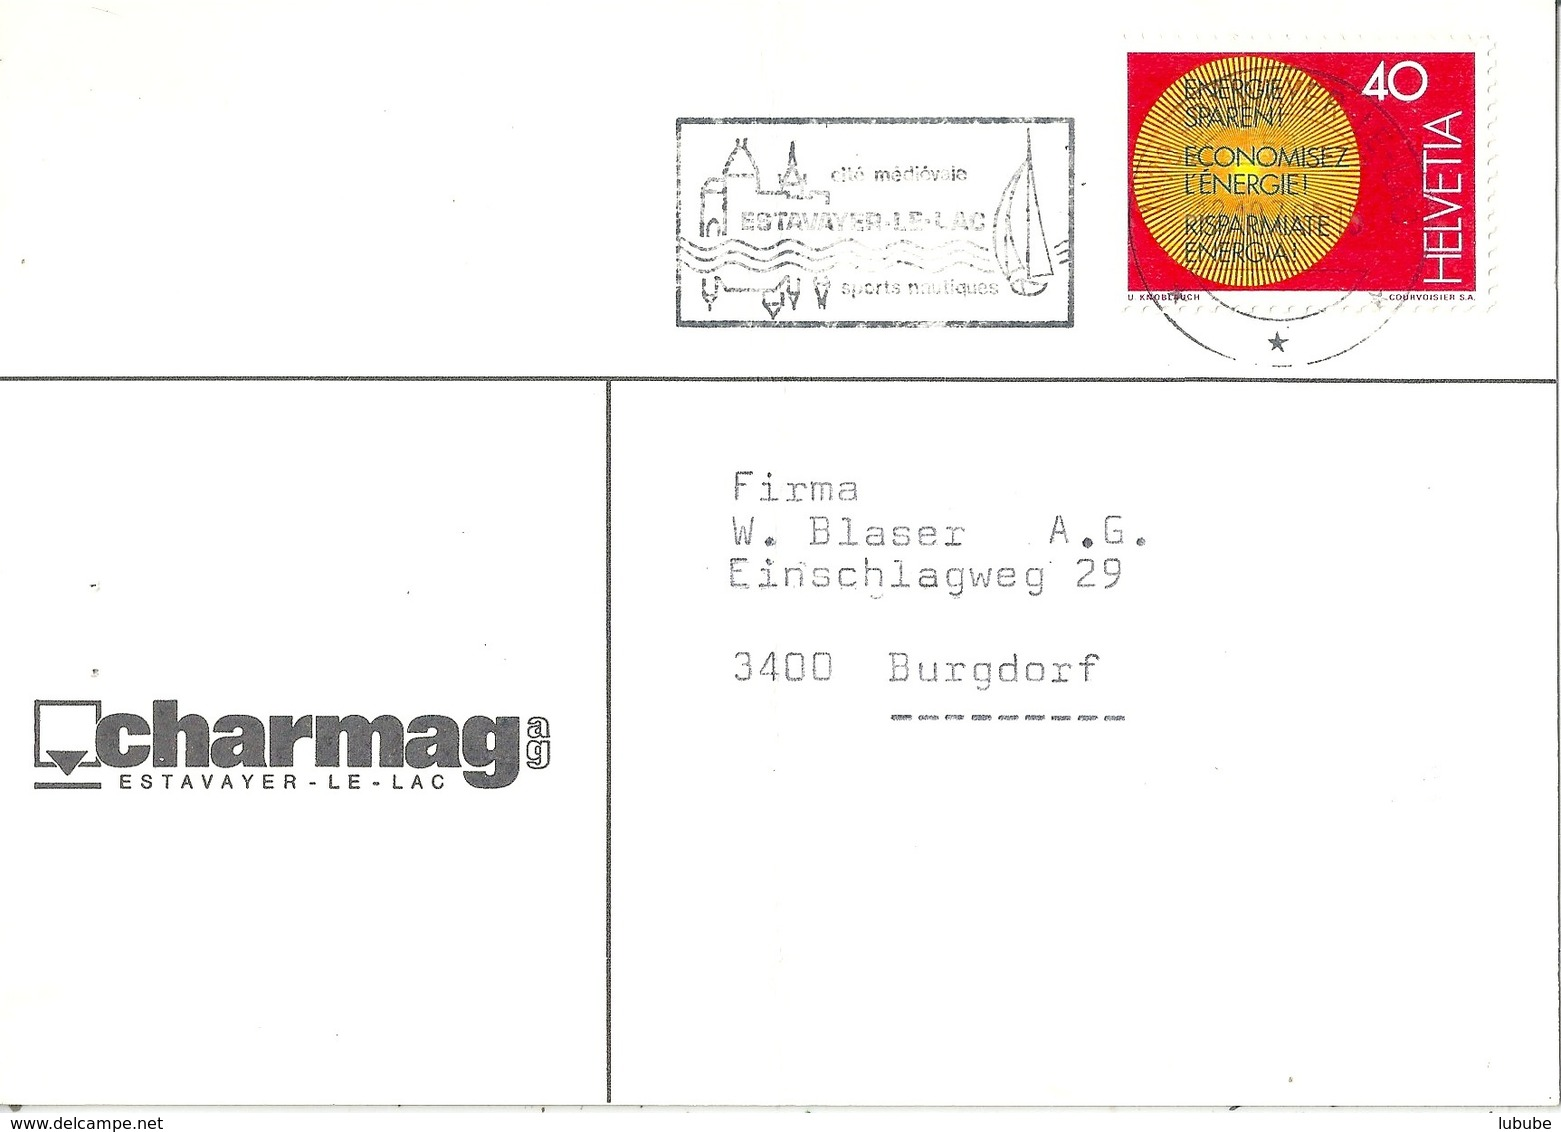 "Motiv Karte  ""Charmag, Estavayer-le-Lac""            1976 - Switzerland"